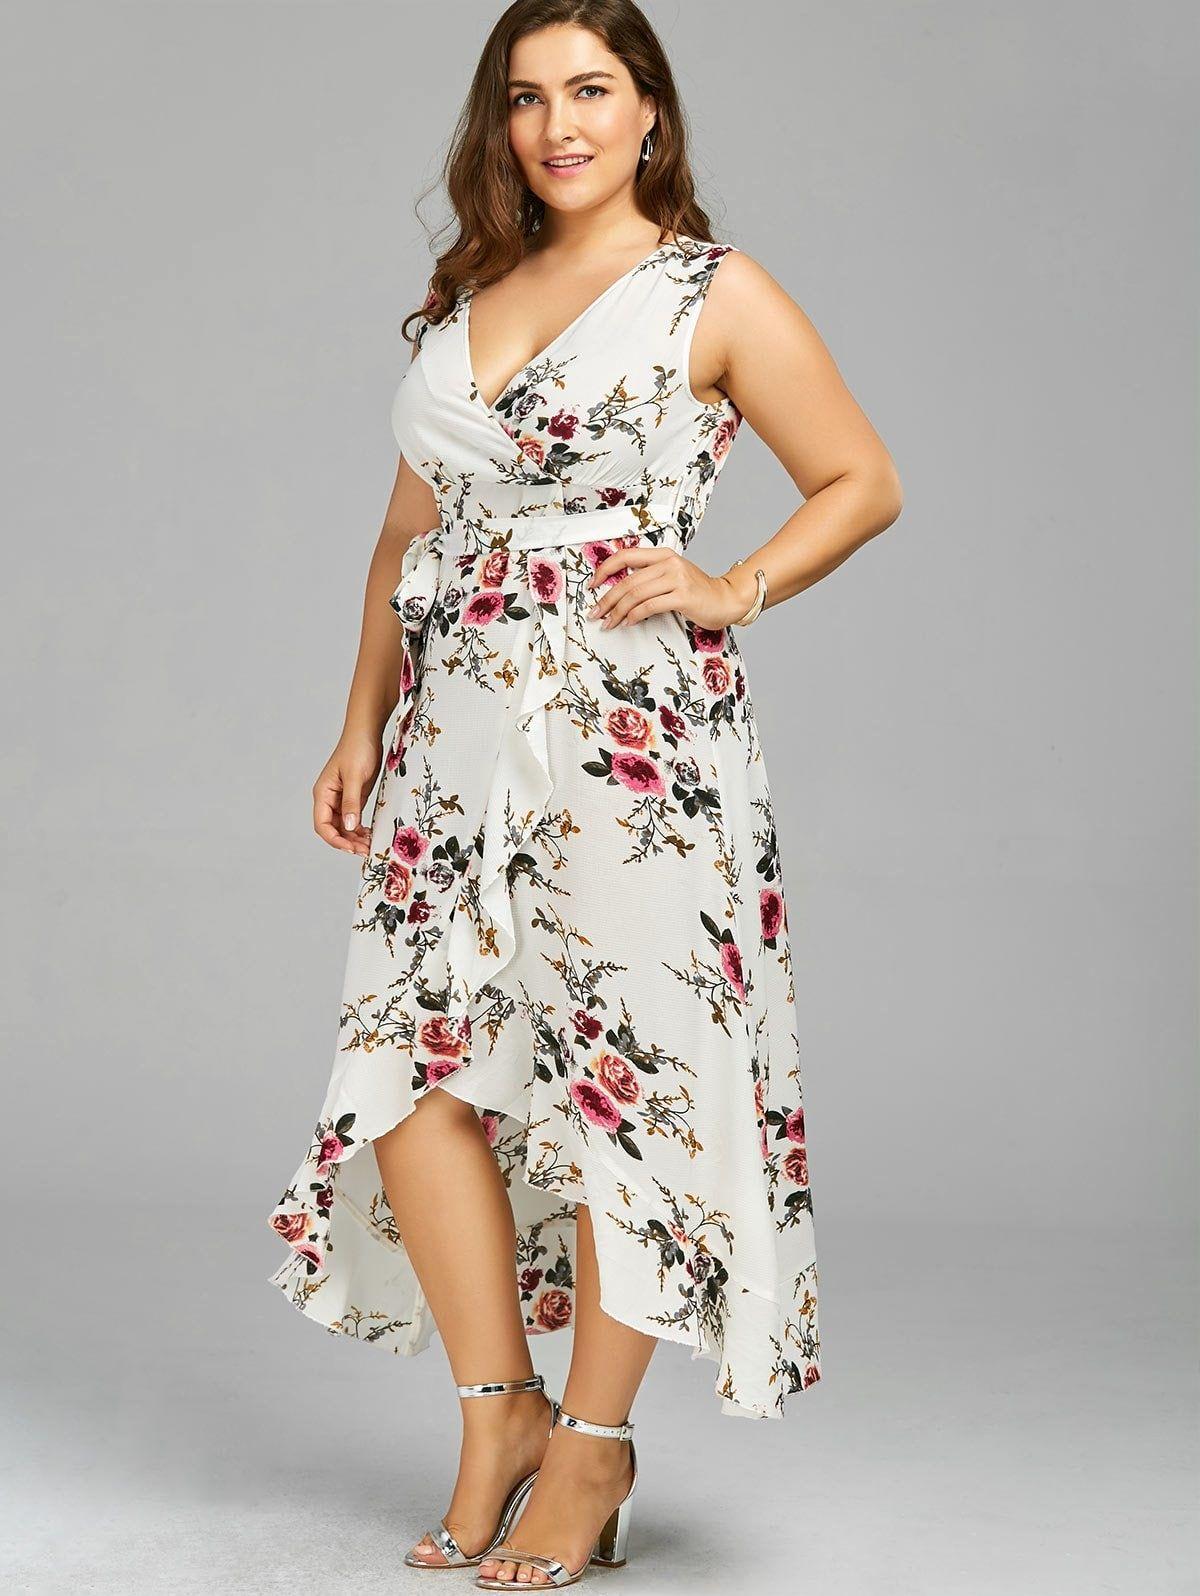 Plus Size Tiny Floral Overlap Flounced Flowy Beach Dress Flowy Beach Dress Floral Dresses Long Plus Size Dresses [ 1596 x 1200 Pixel ]